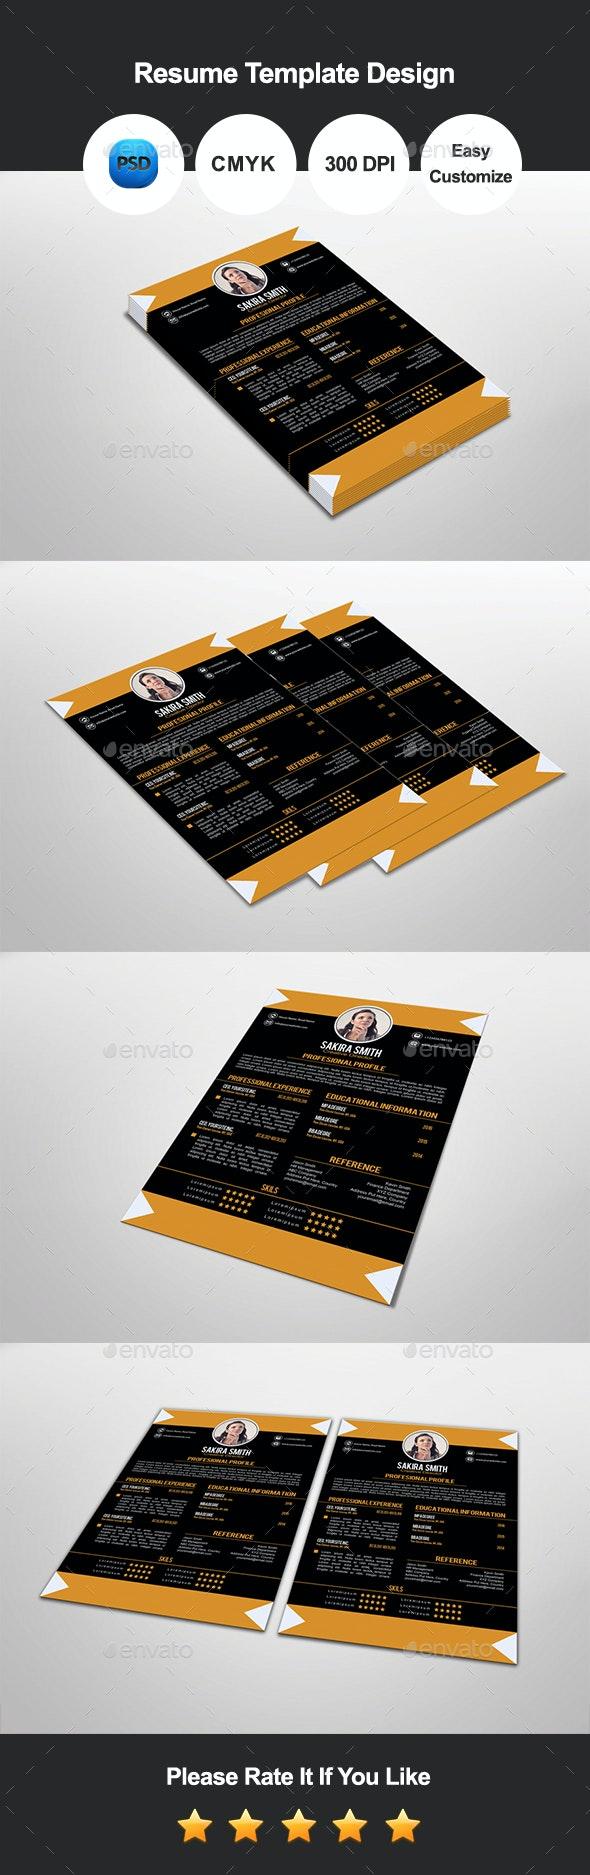 Libani Resume Template Design - Resumes Stationery